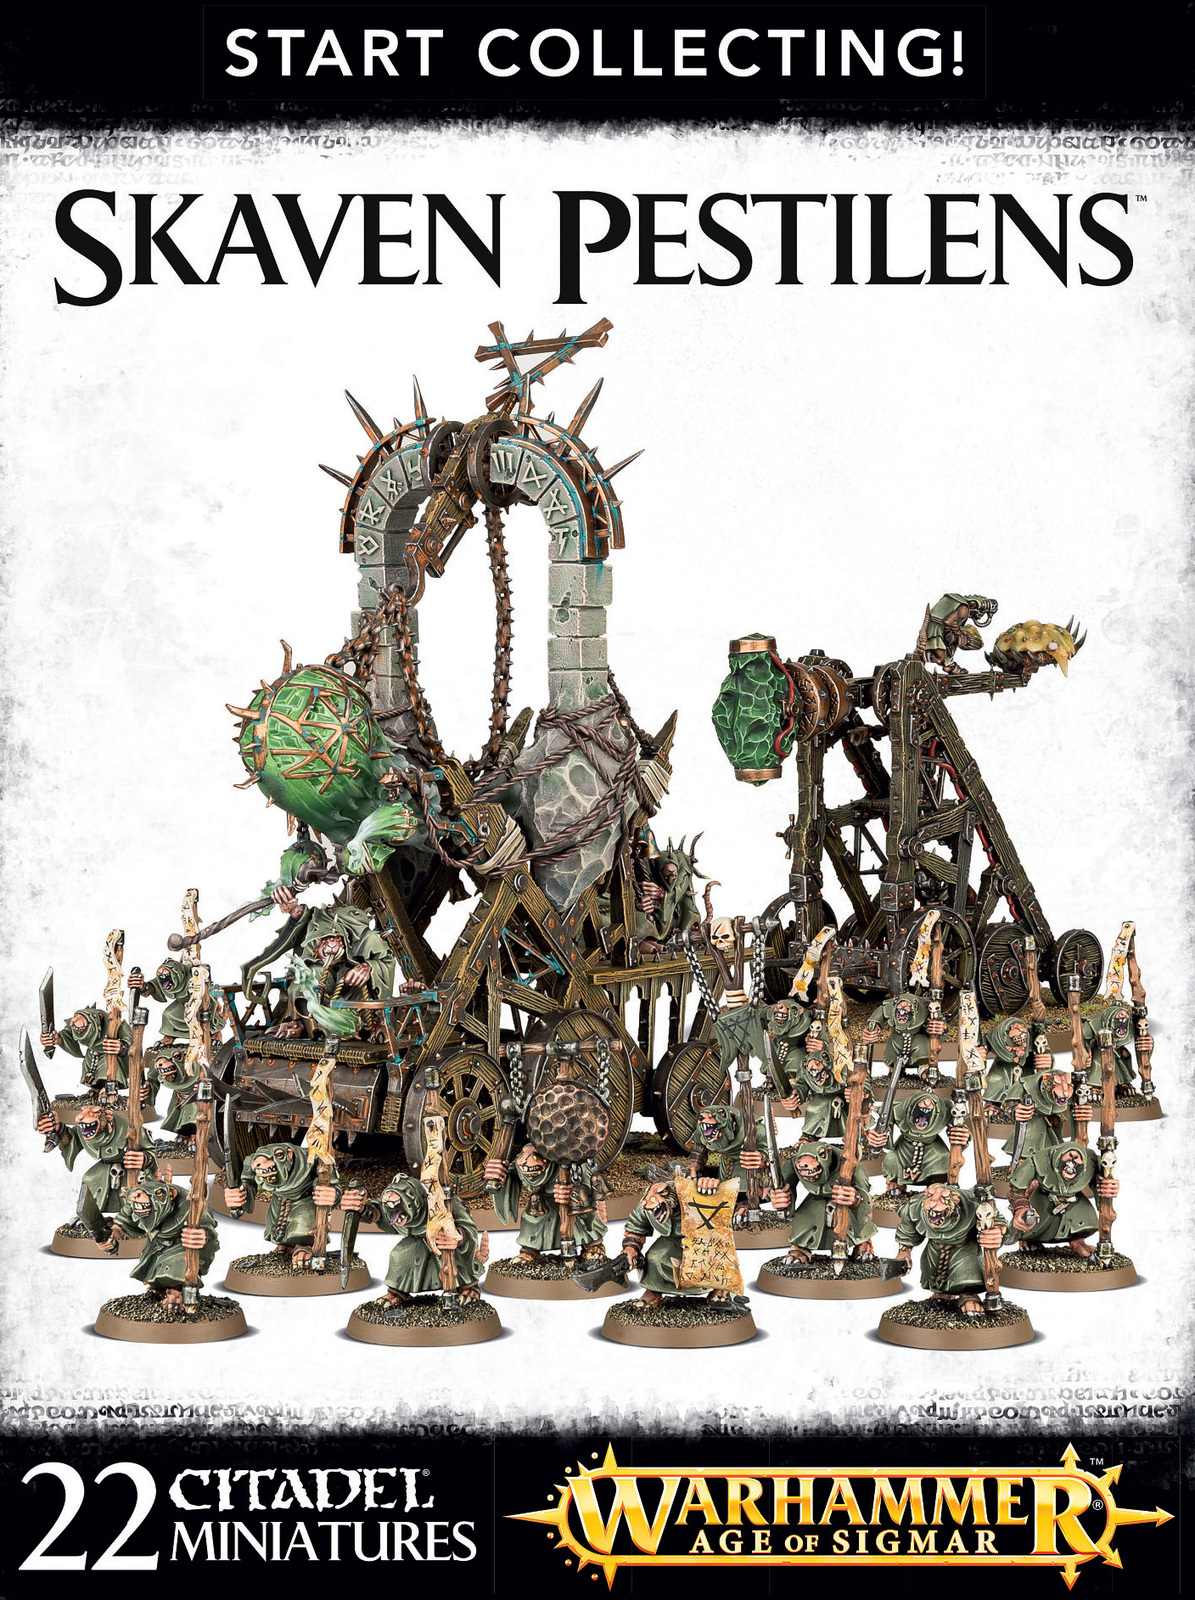 Warhammer Start Collecting: Skaven Pestilens image